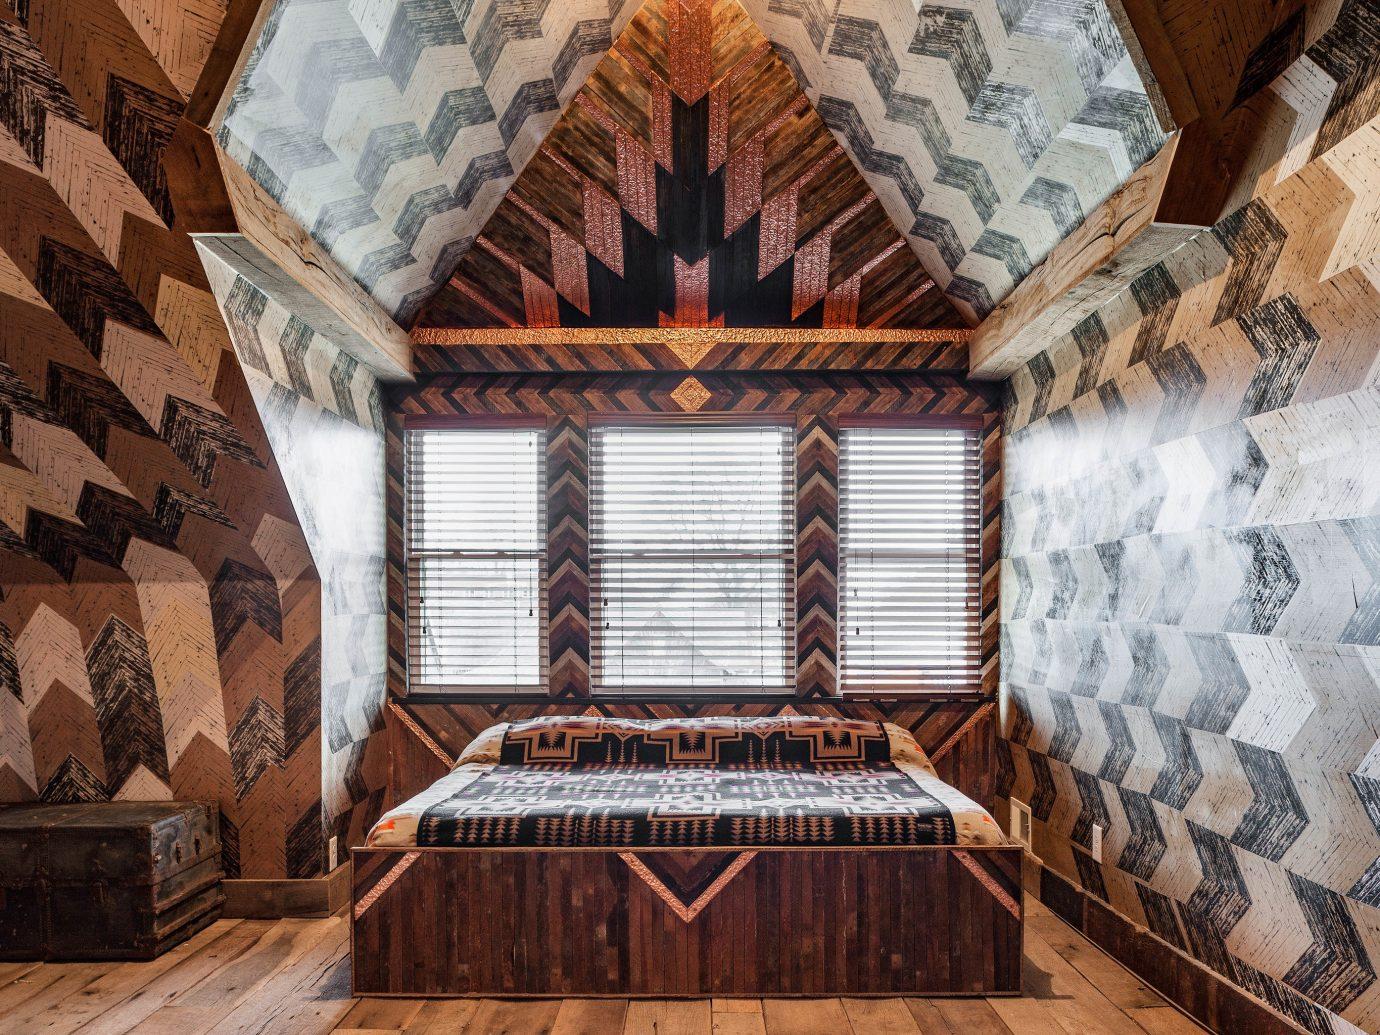 Boutique Hotels Trip Ideas indoor property room wall estate floor interior design mansion Design chapel arch flooring living room ceiling bedclothes